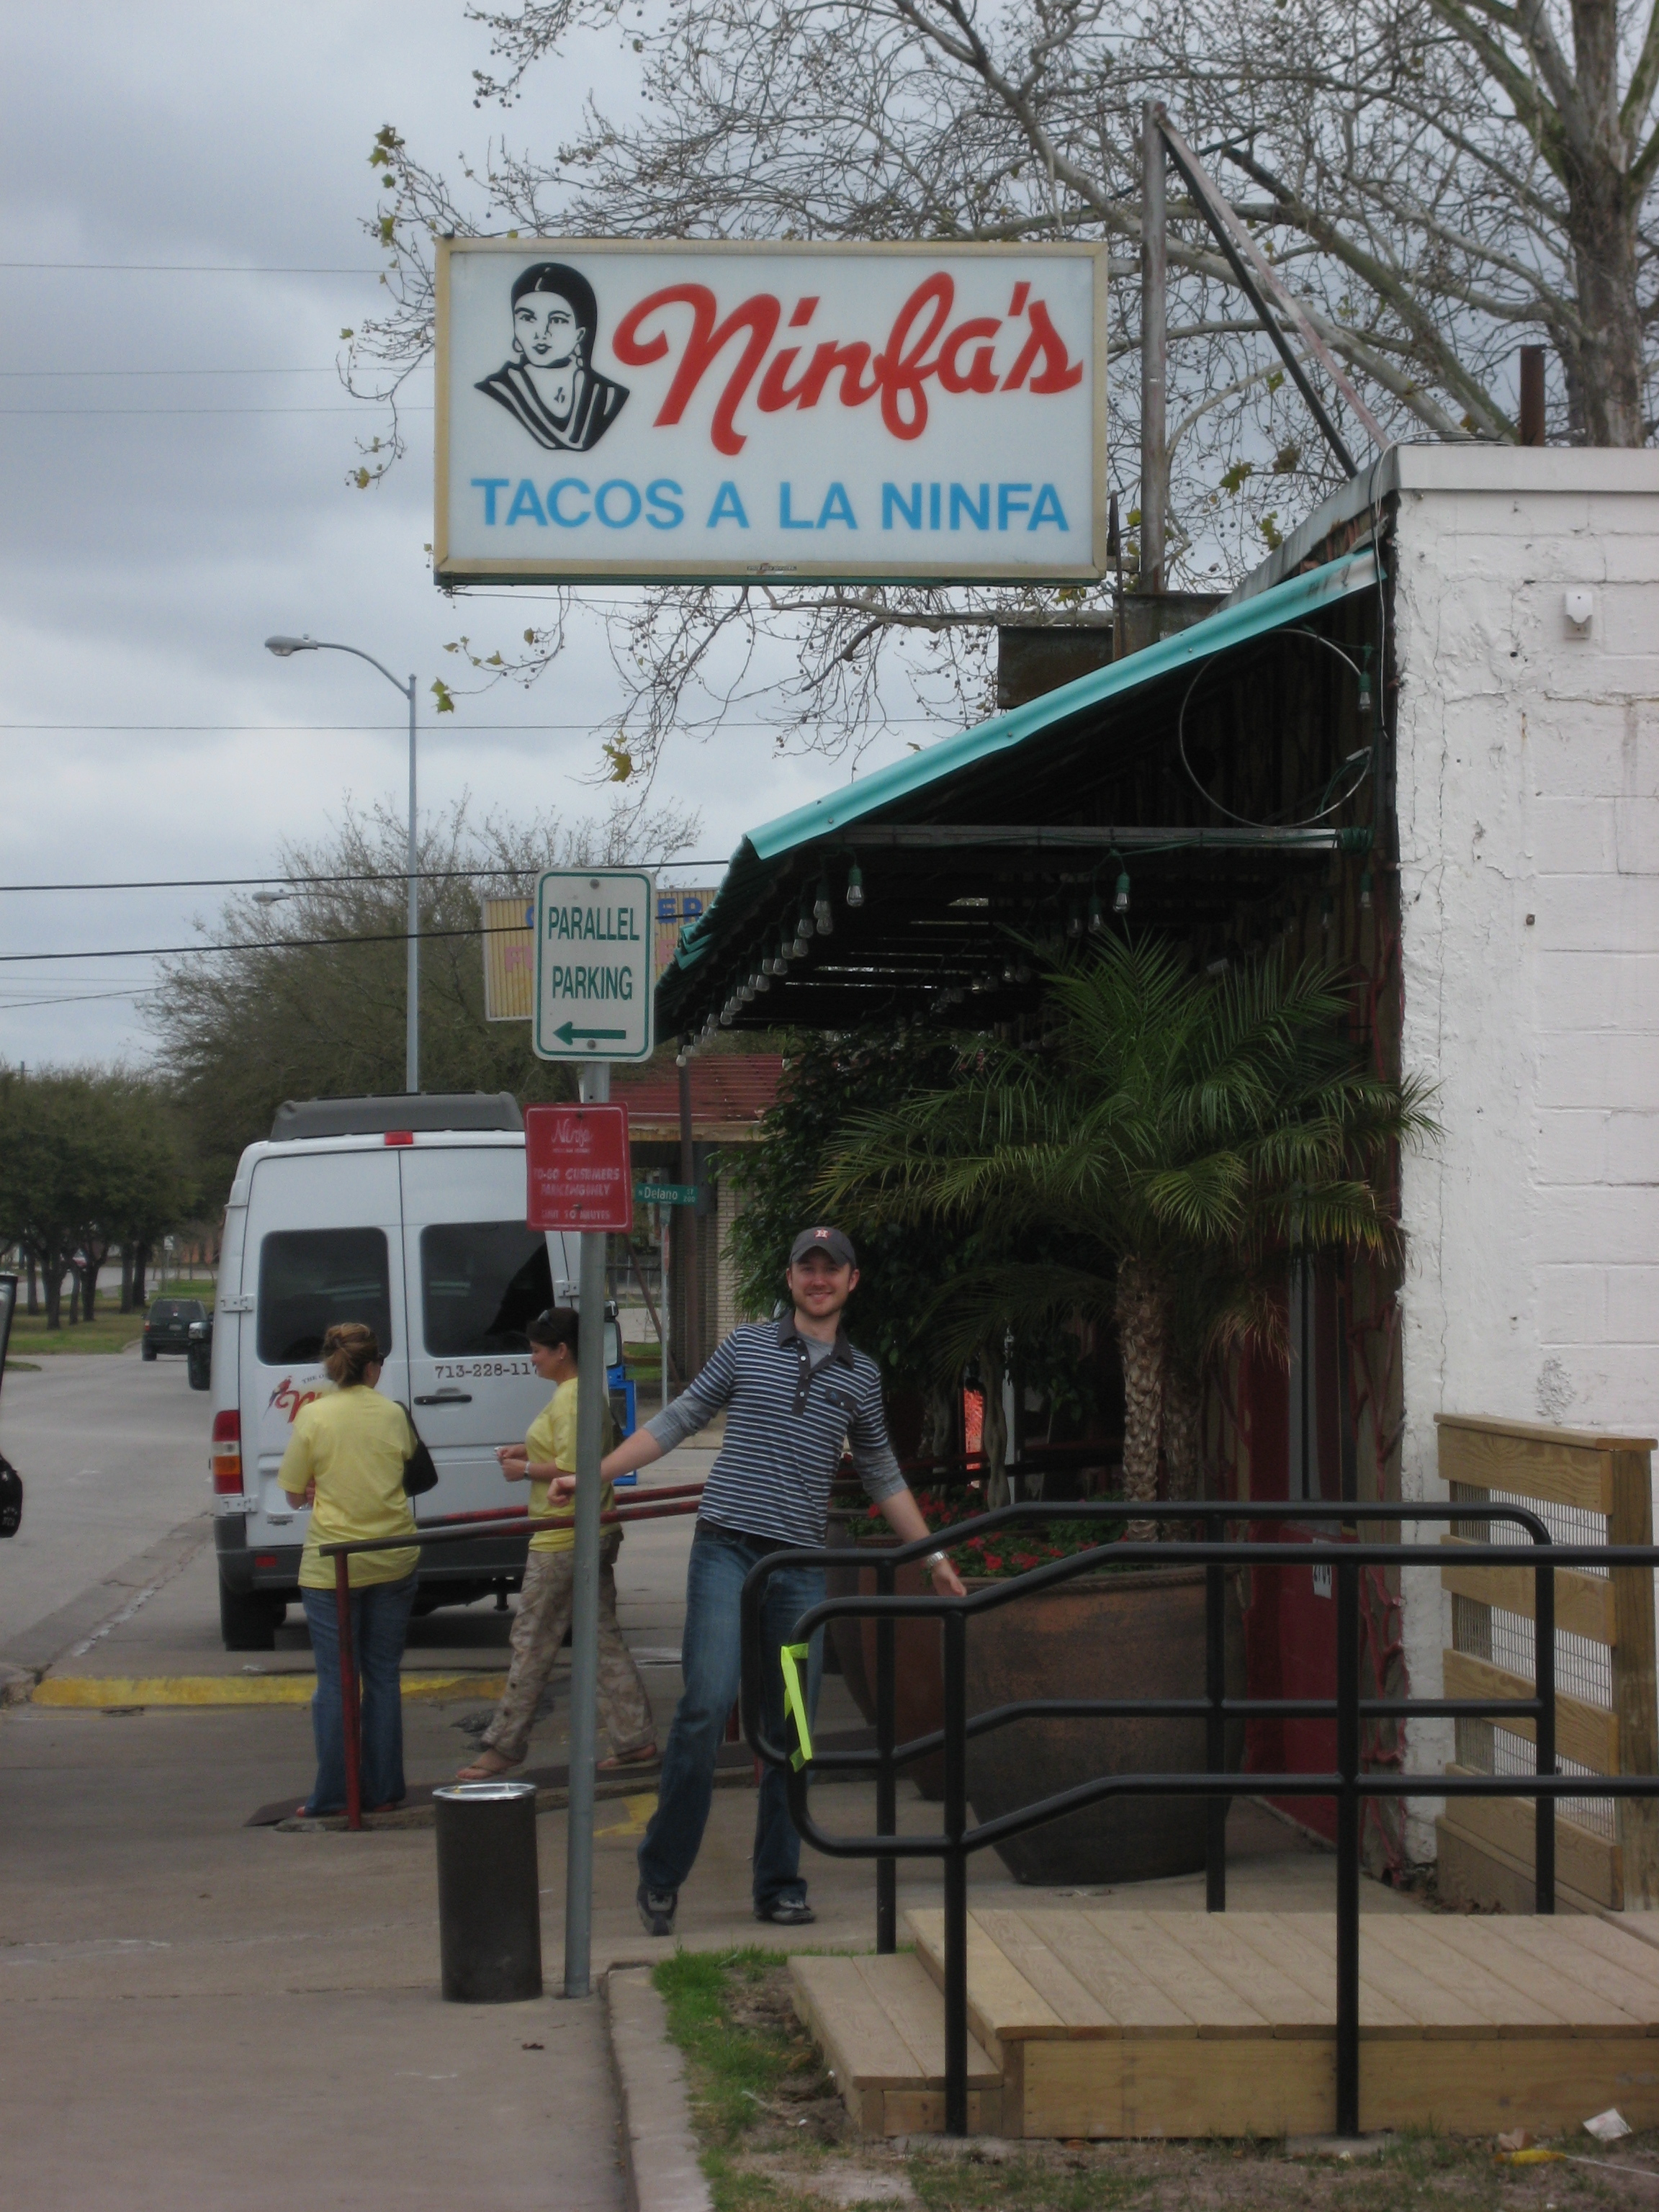 Ninfa's Express - Galleria/Uptown - Houston, TX - Yelp